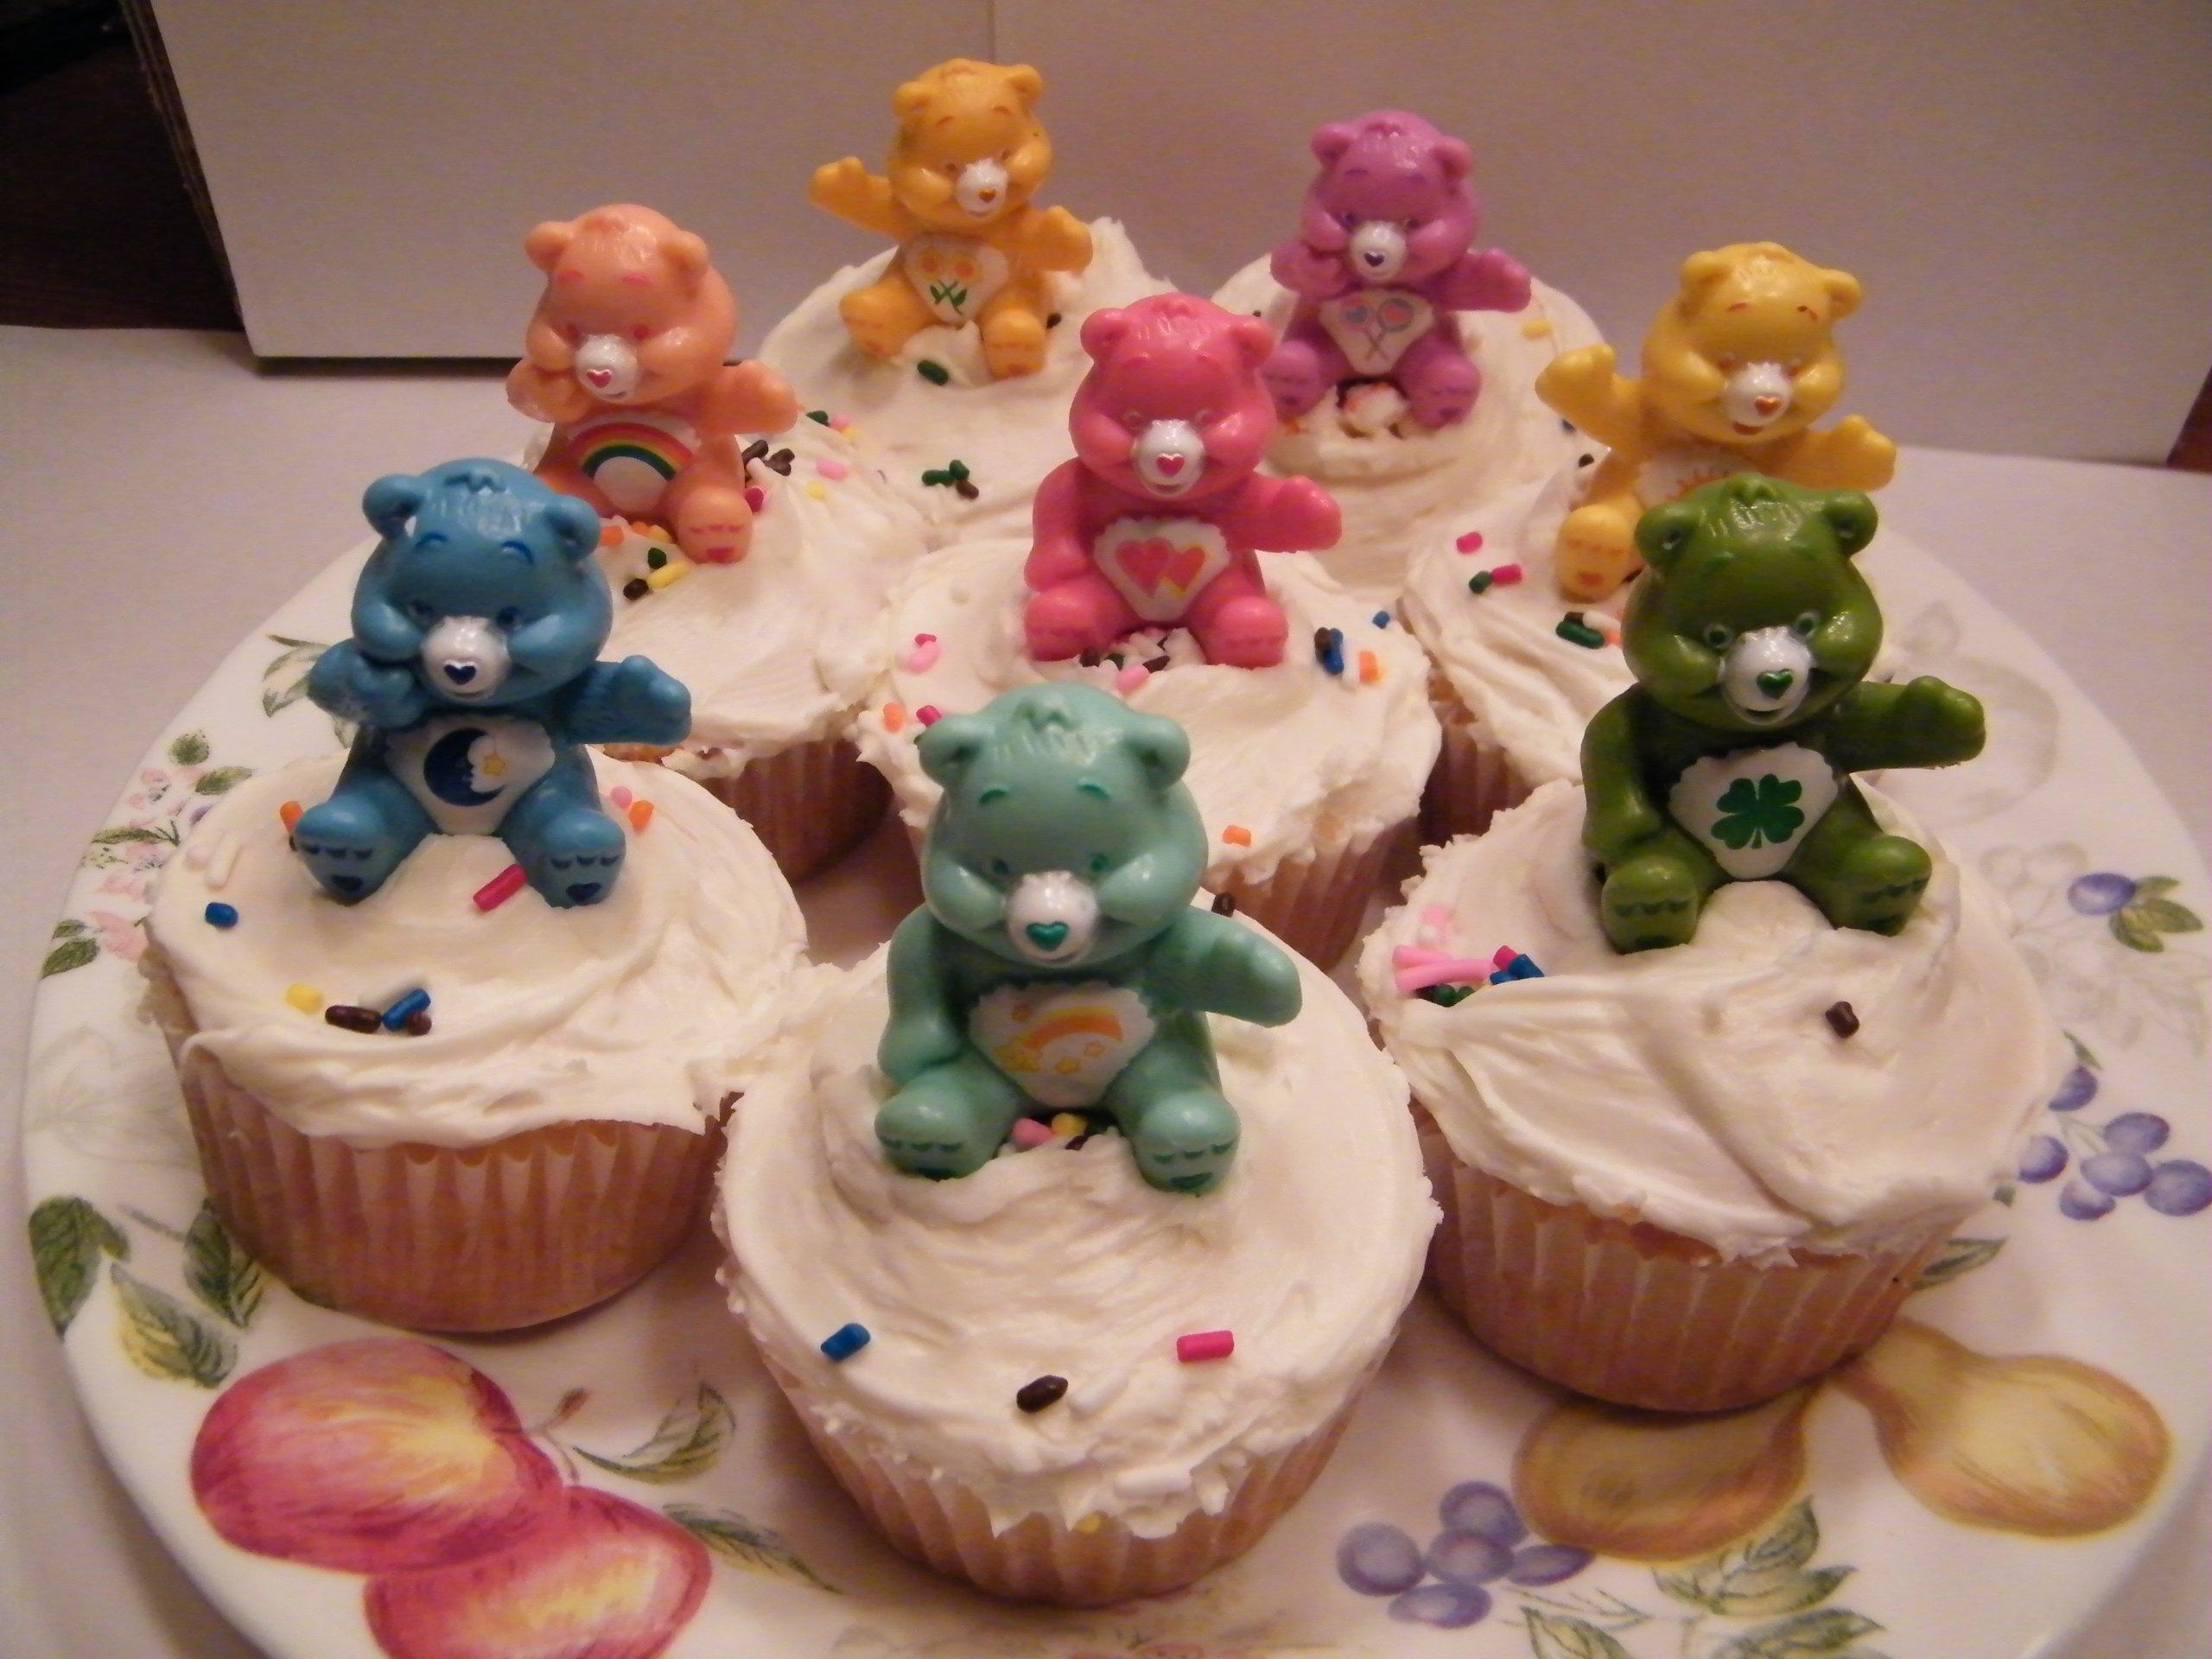 Care Bear Cake Topper / Cupcake Decorations Set of 16